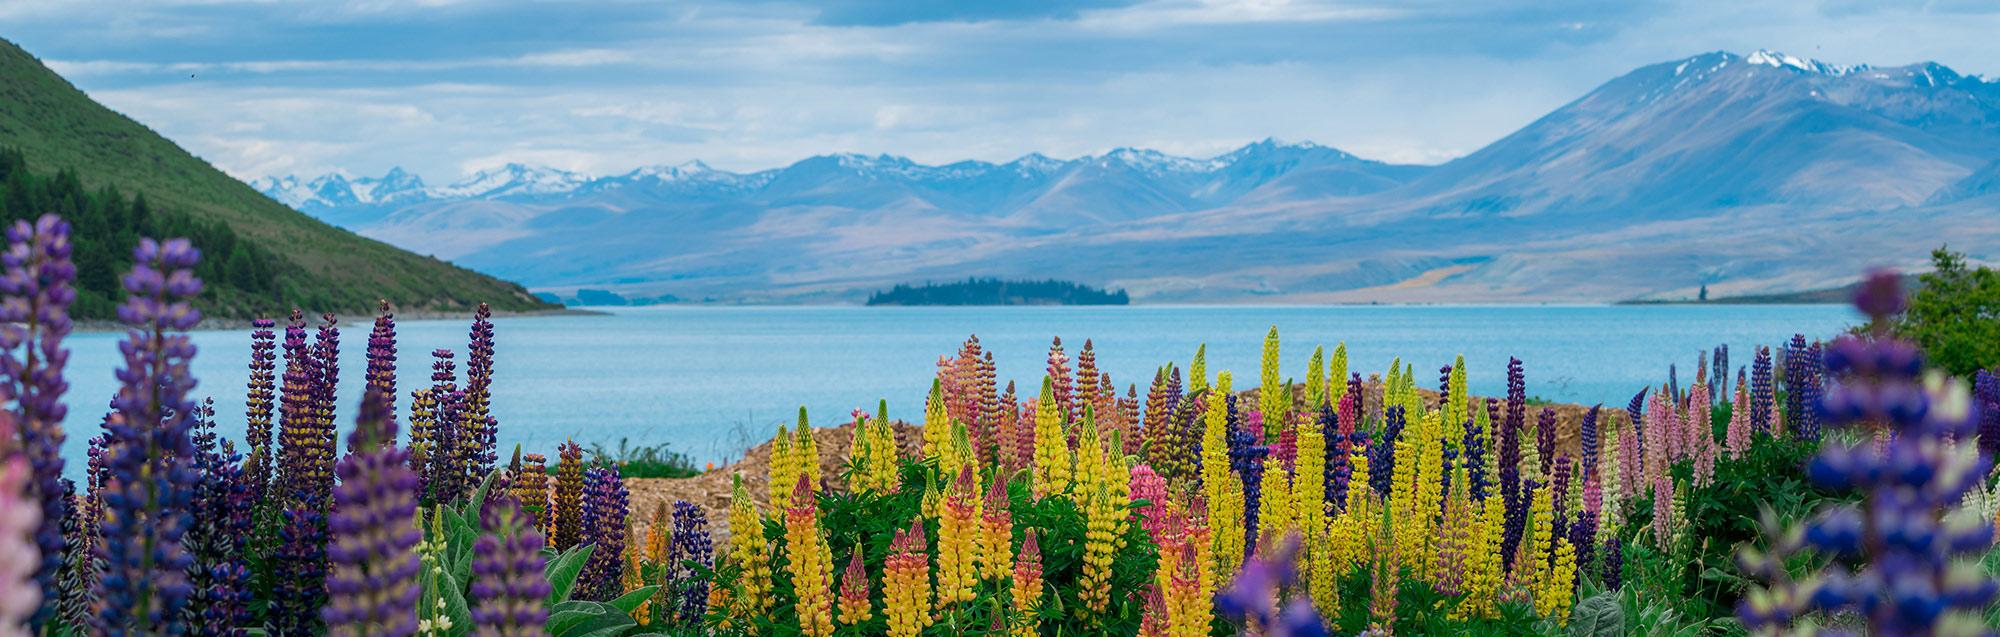 Sprachreise Neuseeland